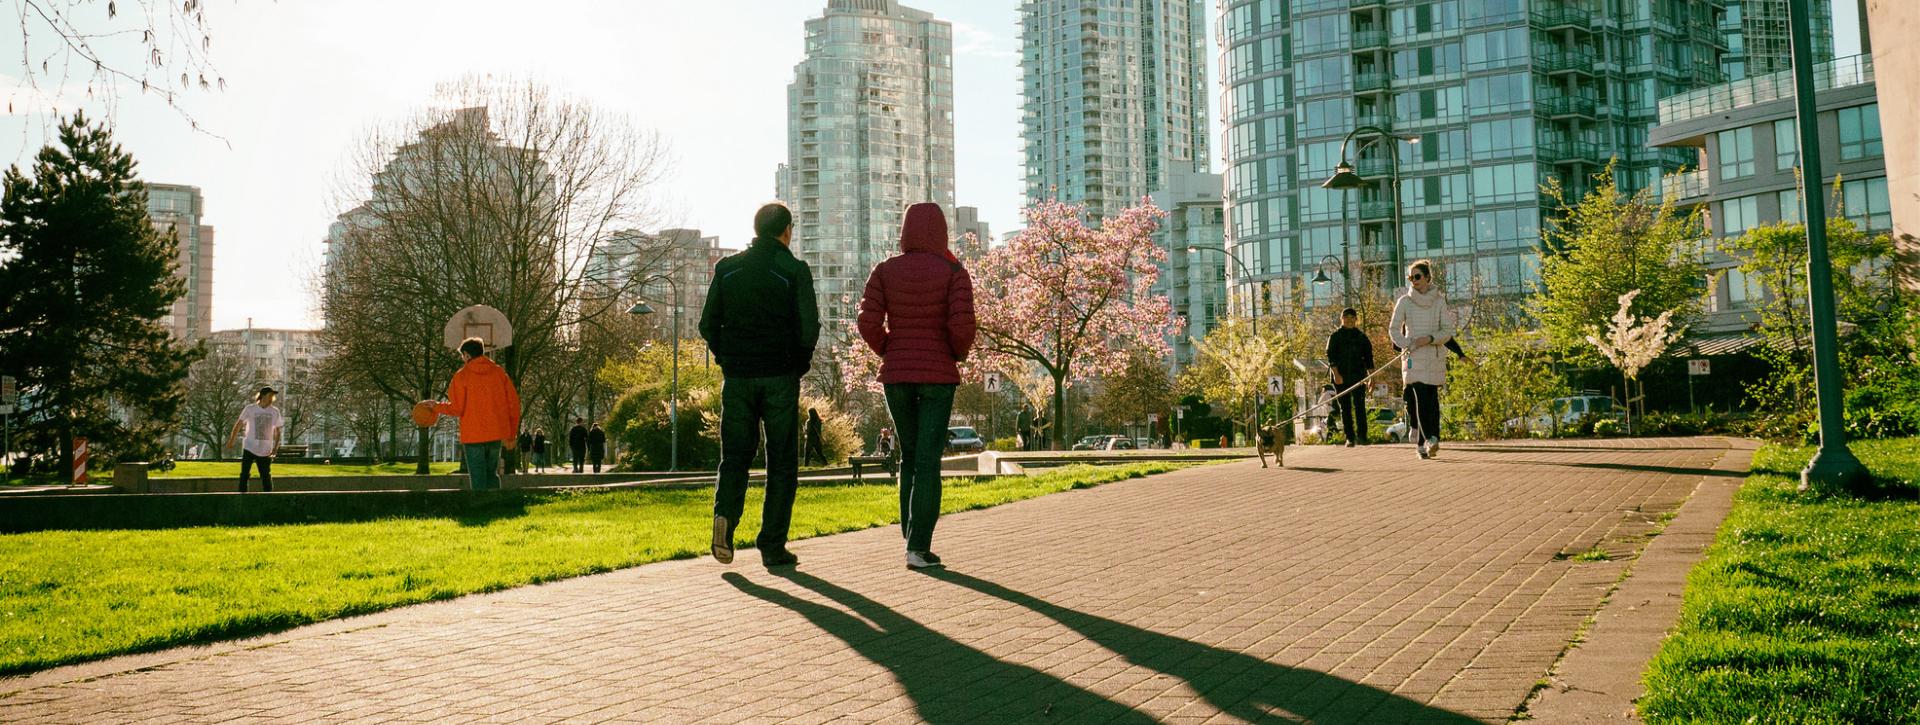 Couple walking through Yaletown, Vancouver